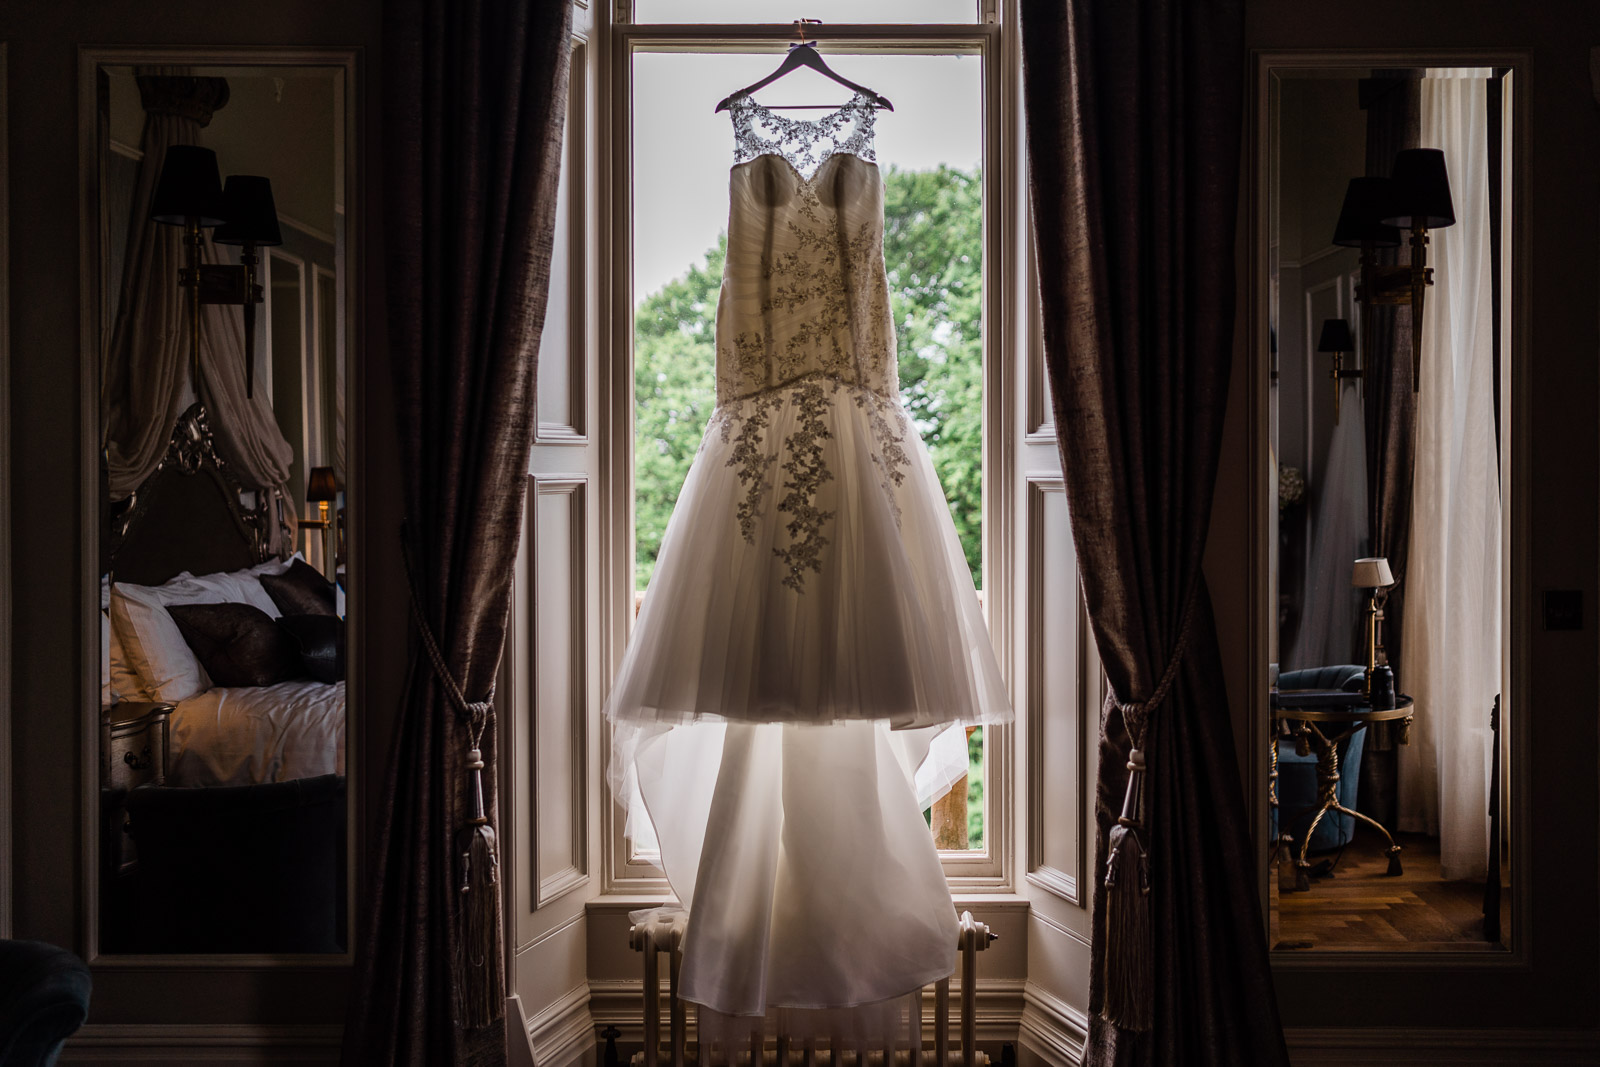 cornhill_castle_wedding_biggar_dearlyphotography (38 of 448).jpg